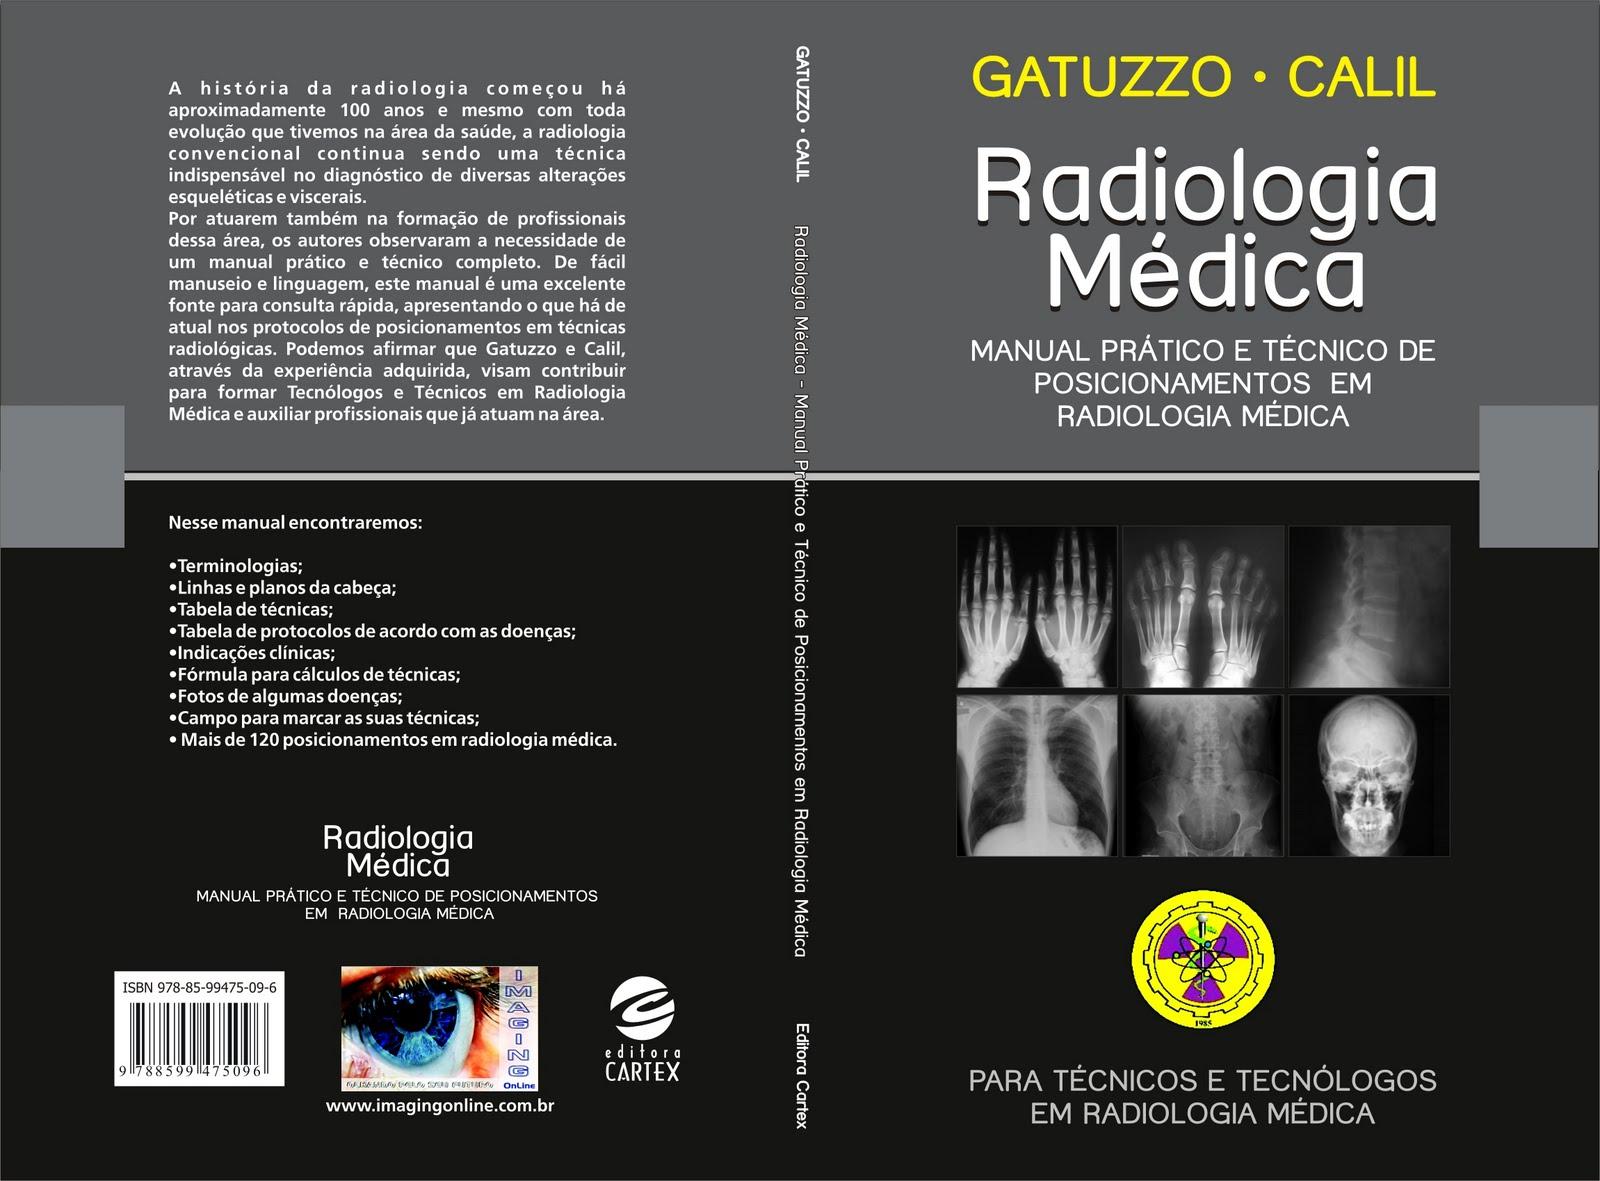 Portfólio | Kelly de Castro Martins: Livro | Radiologia